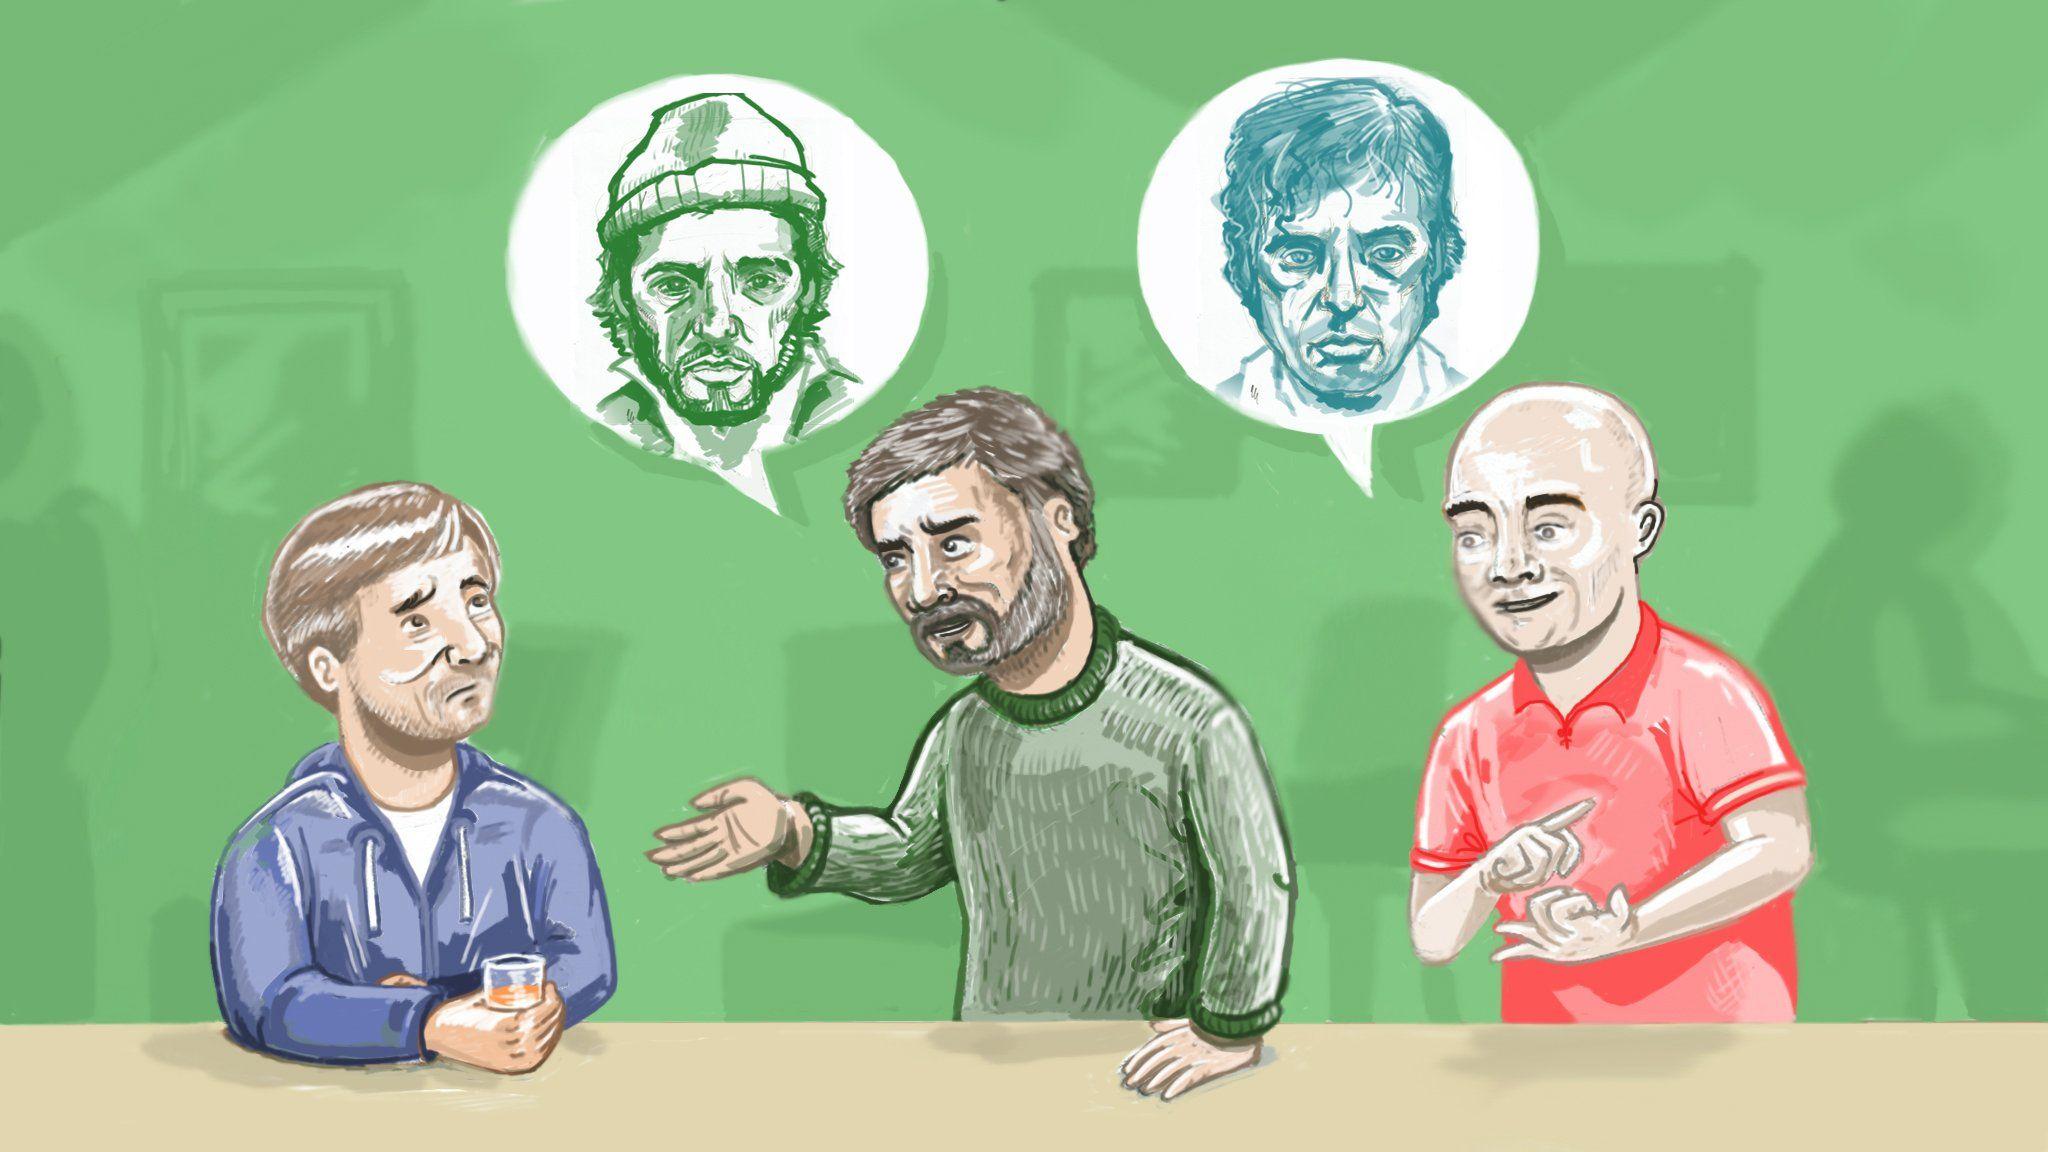 Illustration of Frank Burton participating in a pub quiz